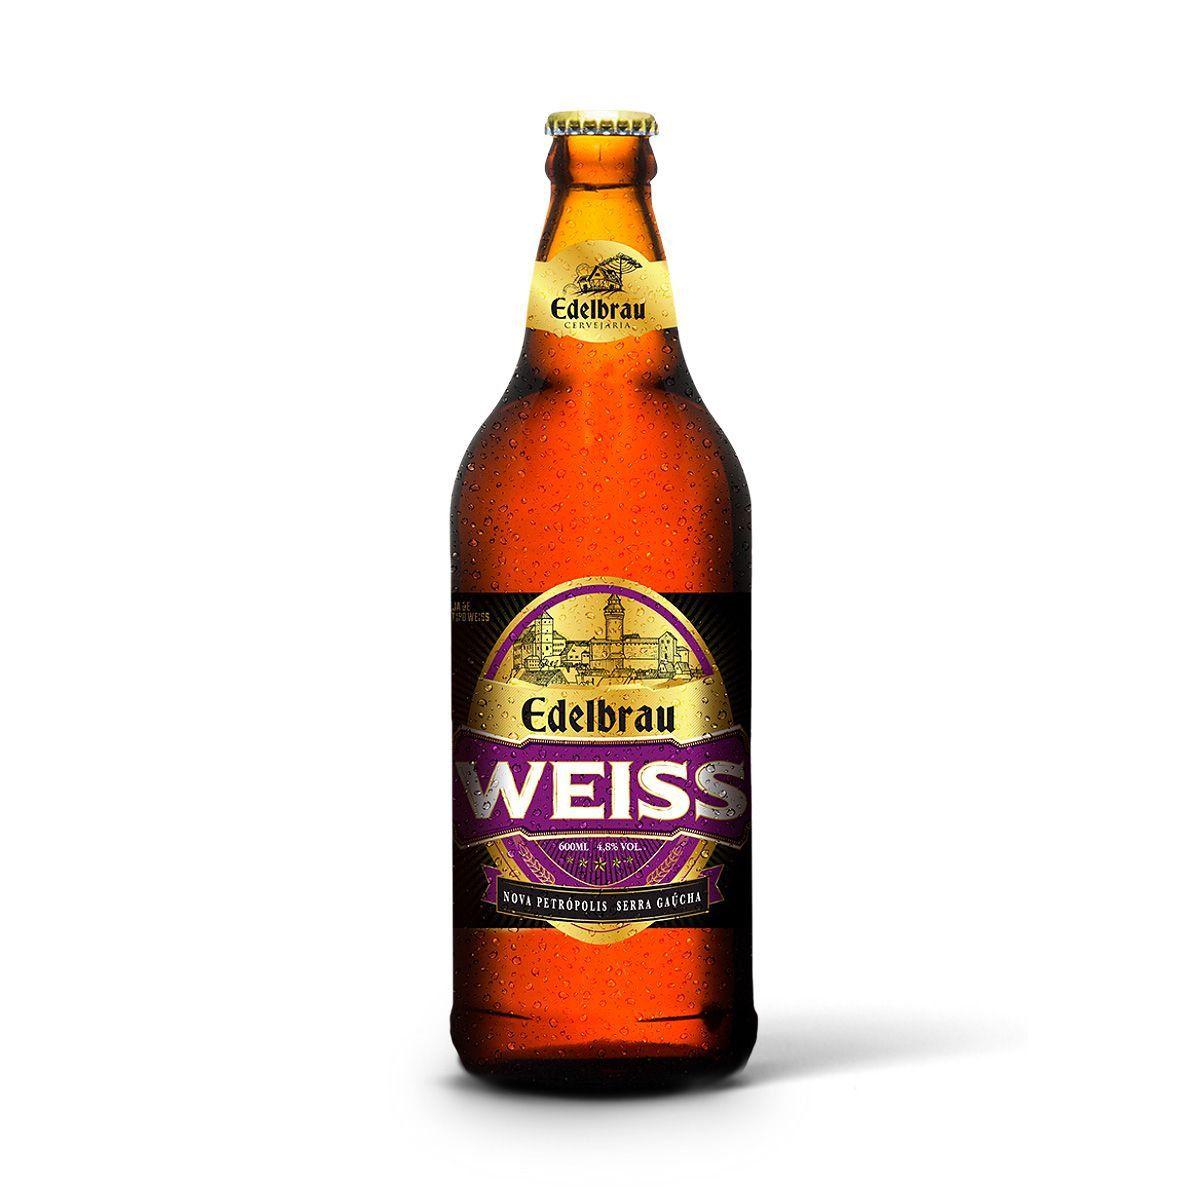 Edelbrau Weiss 600ml